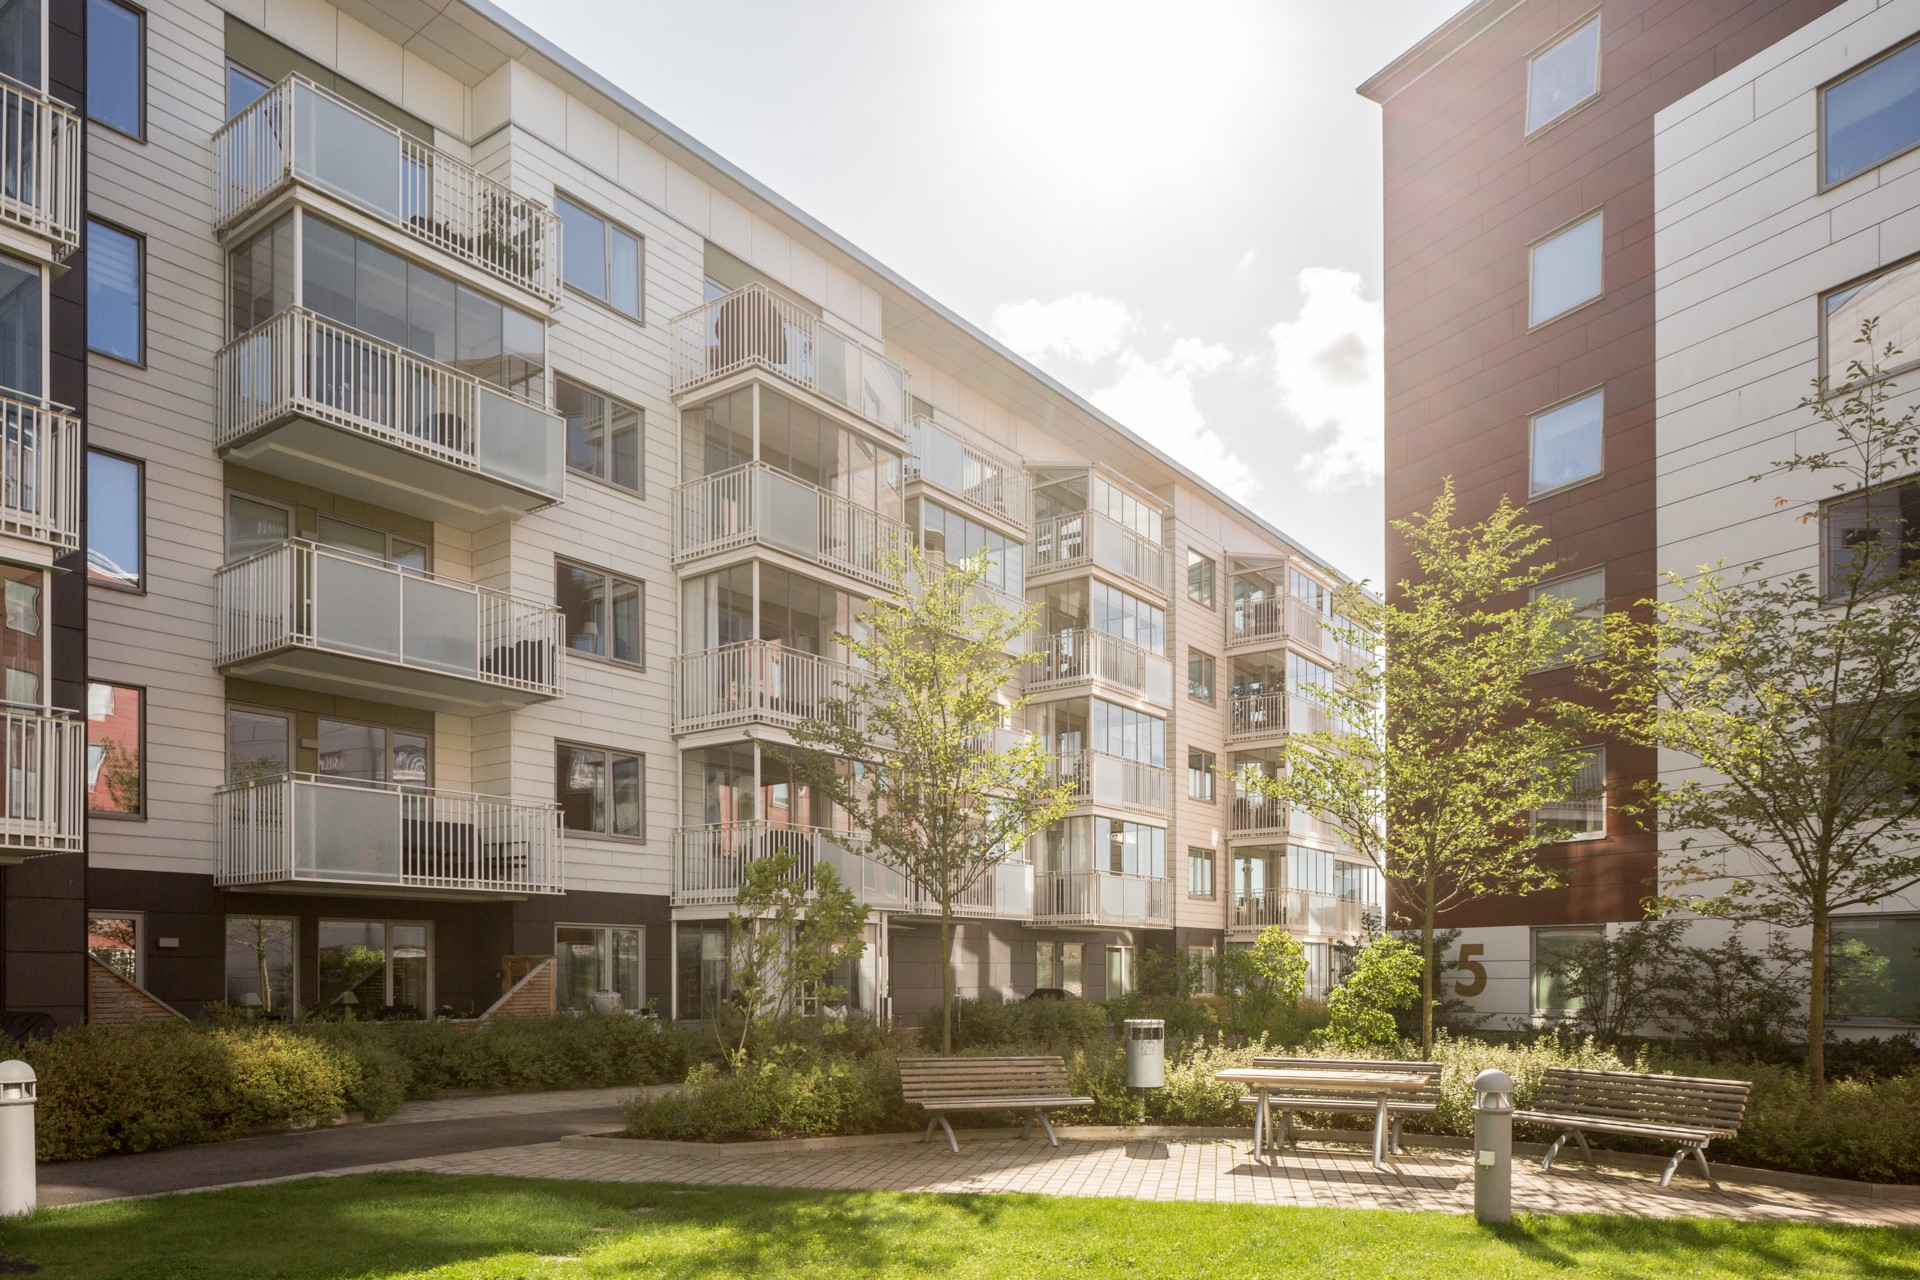 Stenbocksgatan 9-17